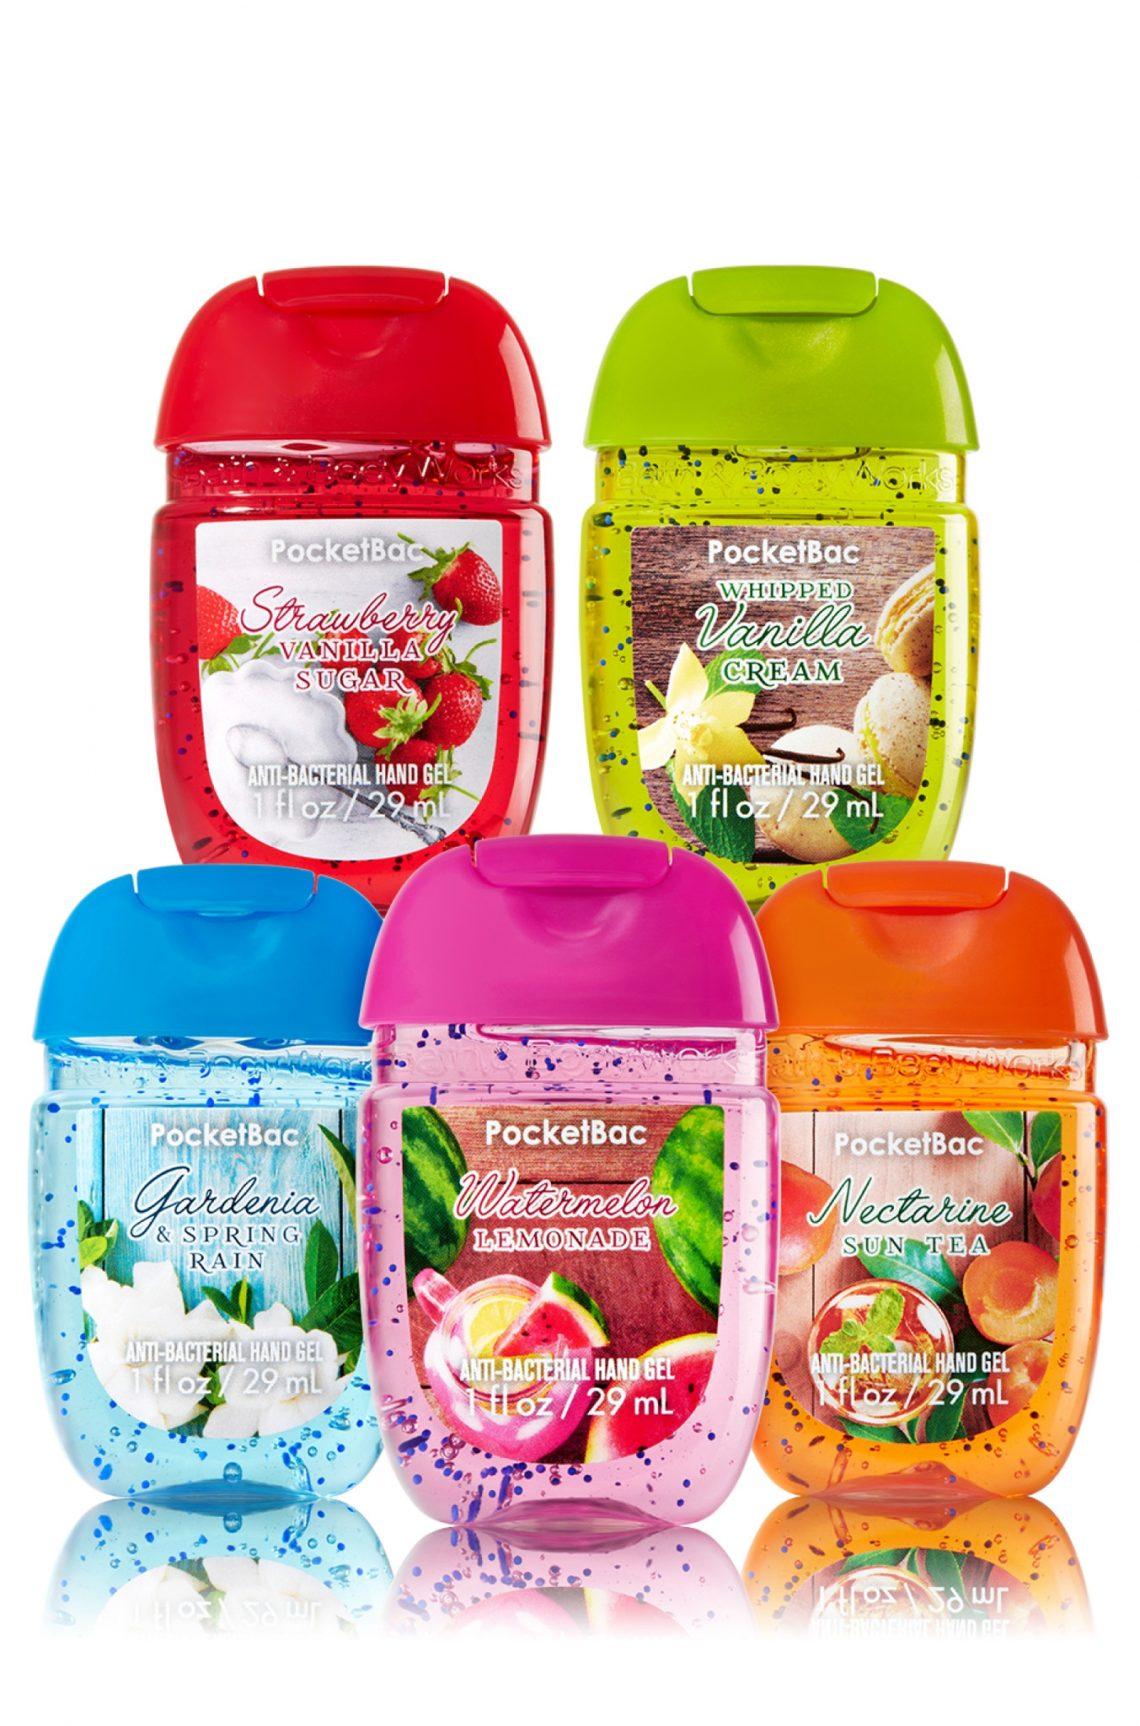 Pocketbac Anti-Bacterial Hand Sanitiser - Bath & Body Works Spring Pack